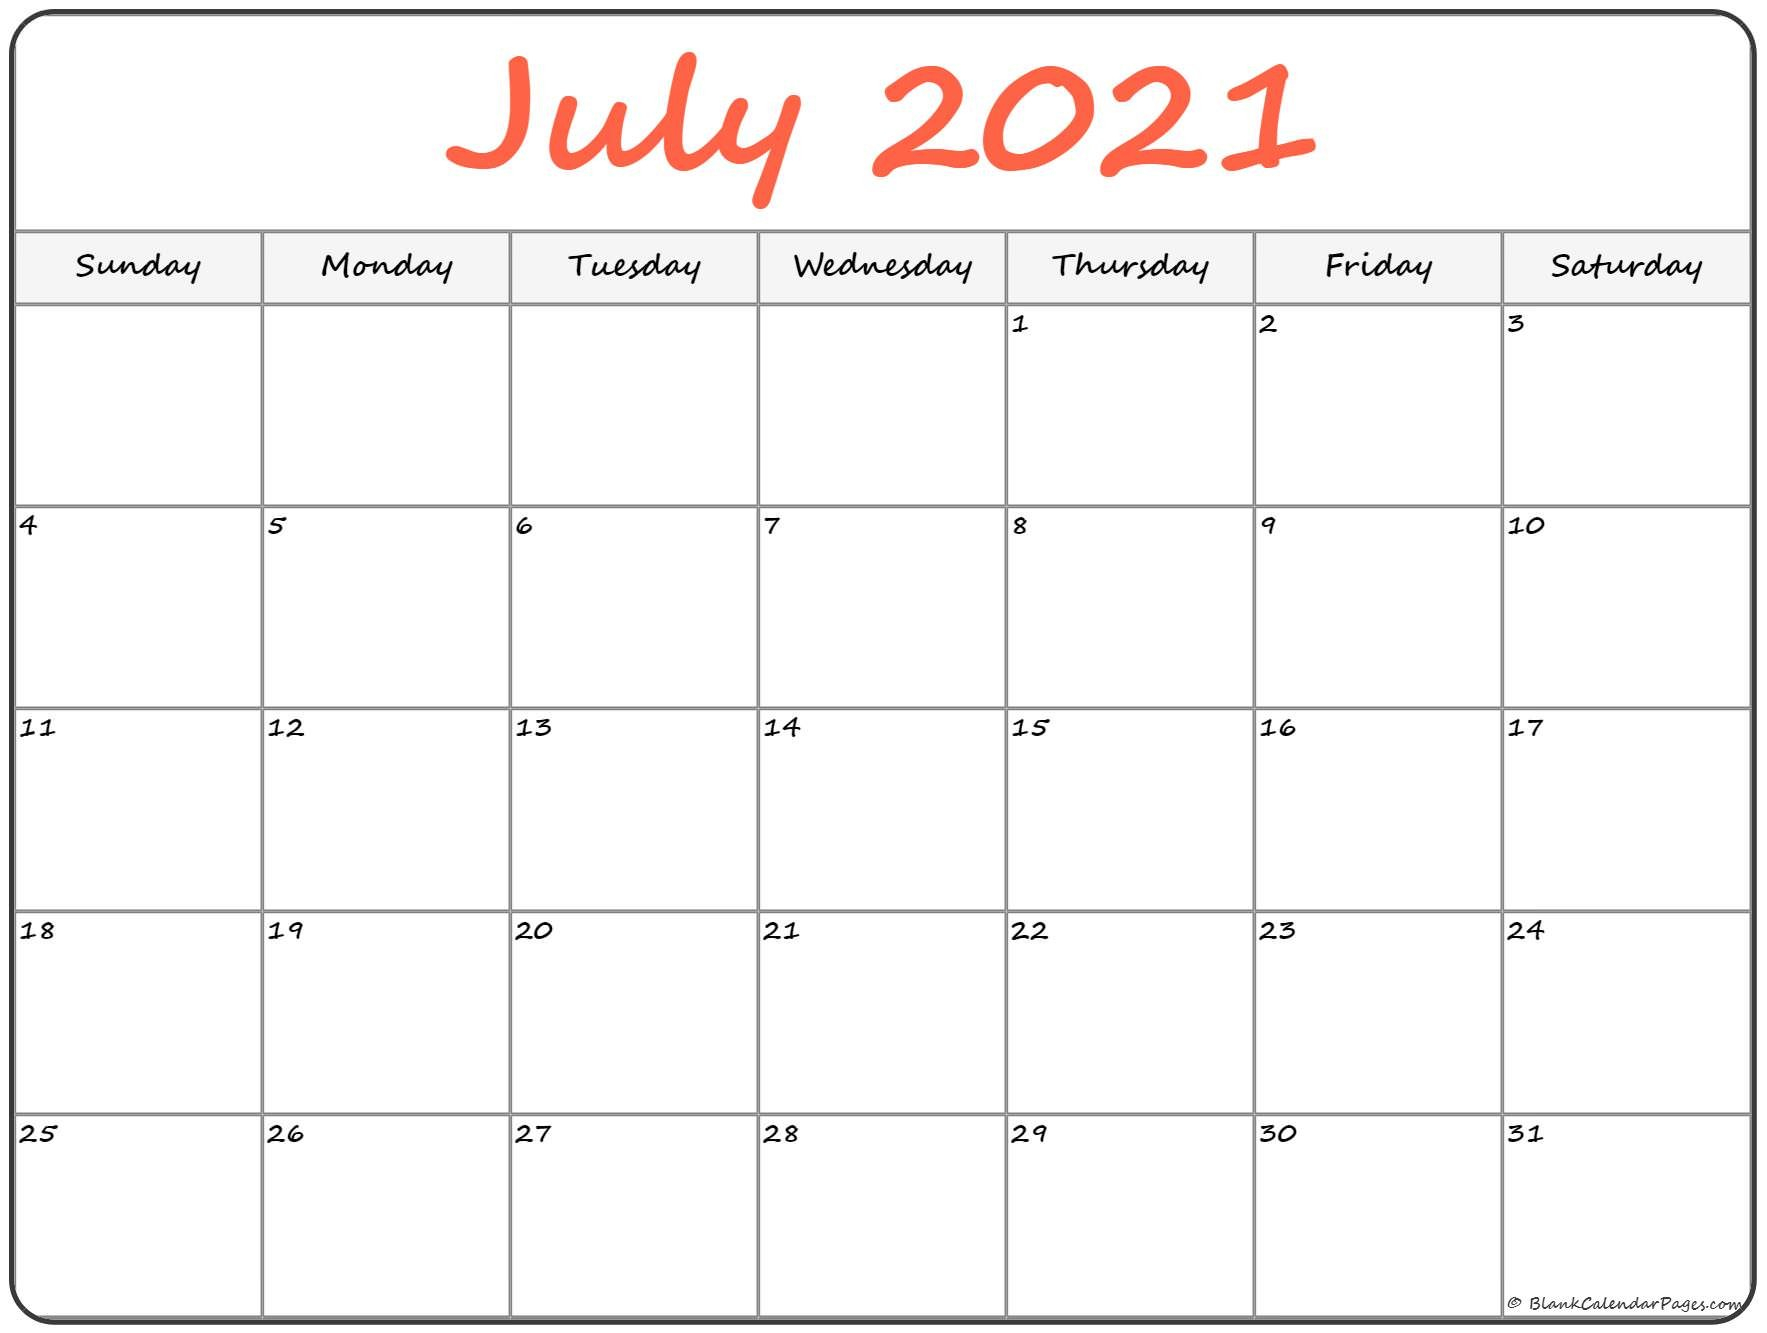 July 2021 Calendar | Free Printable Calendar Free Bold Printable Calnder Jully